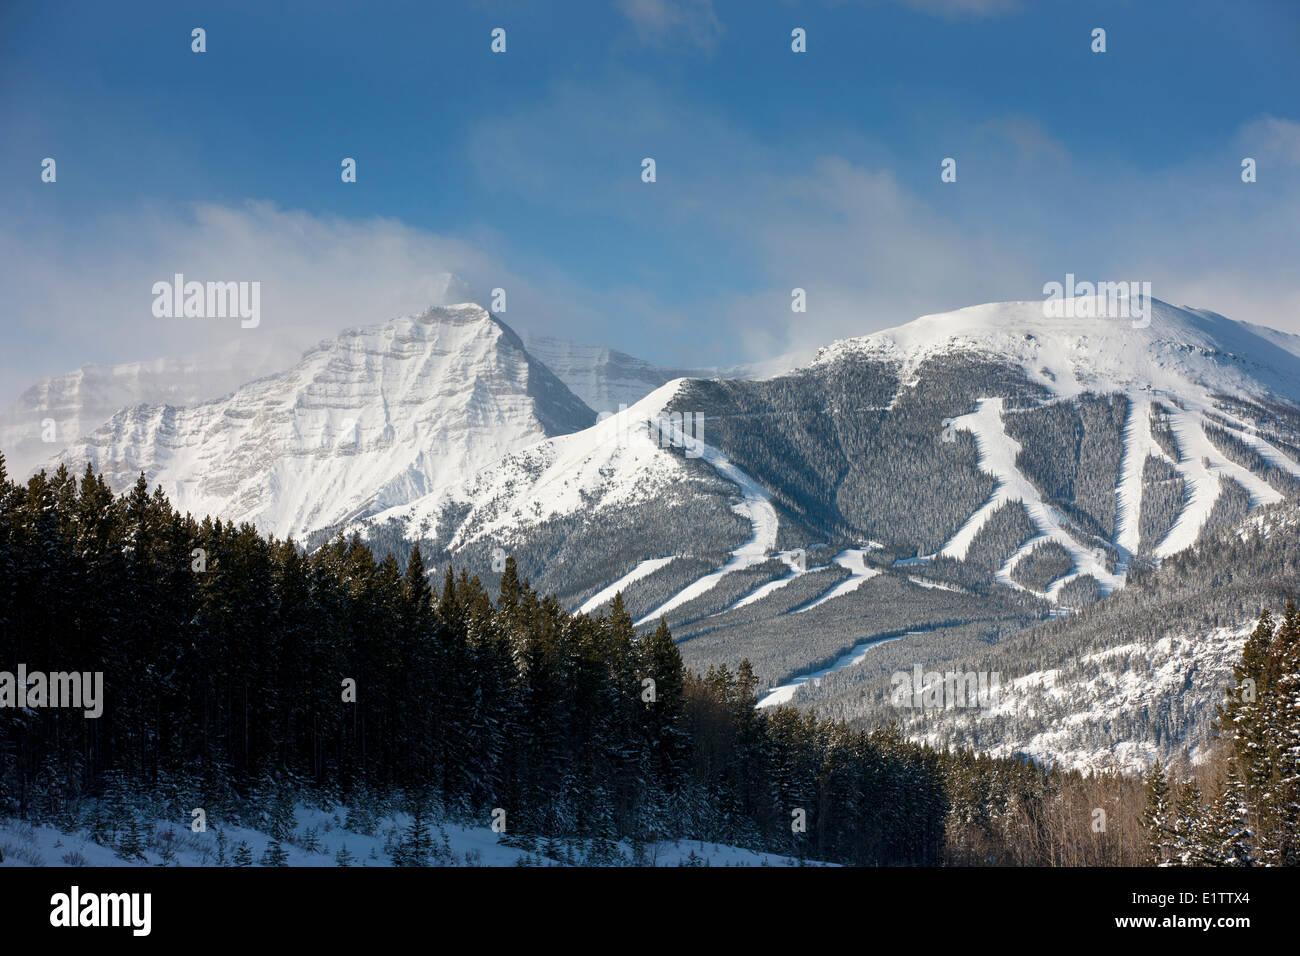 Nakiska Ski Resort, Olympic Summit,  Centennial Ridge, Mount Allan, Kananaskis Provincial park, Alberta, Canada - Stock Image